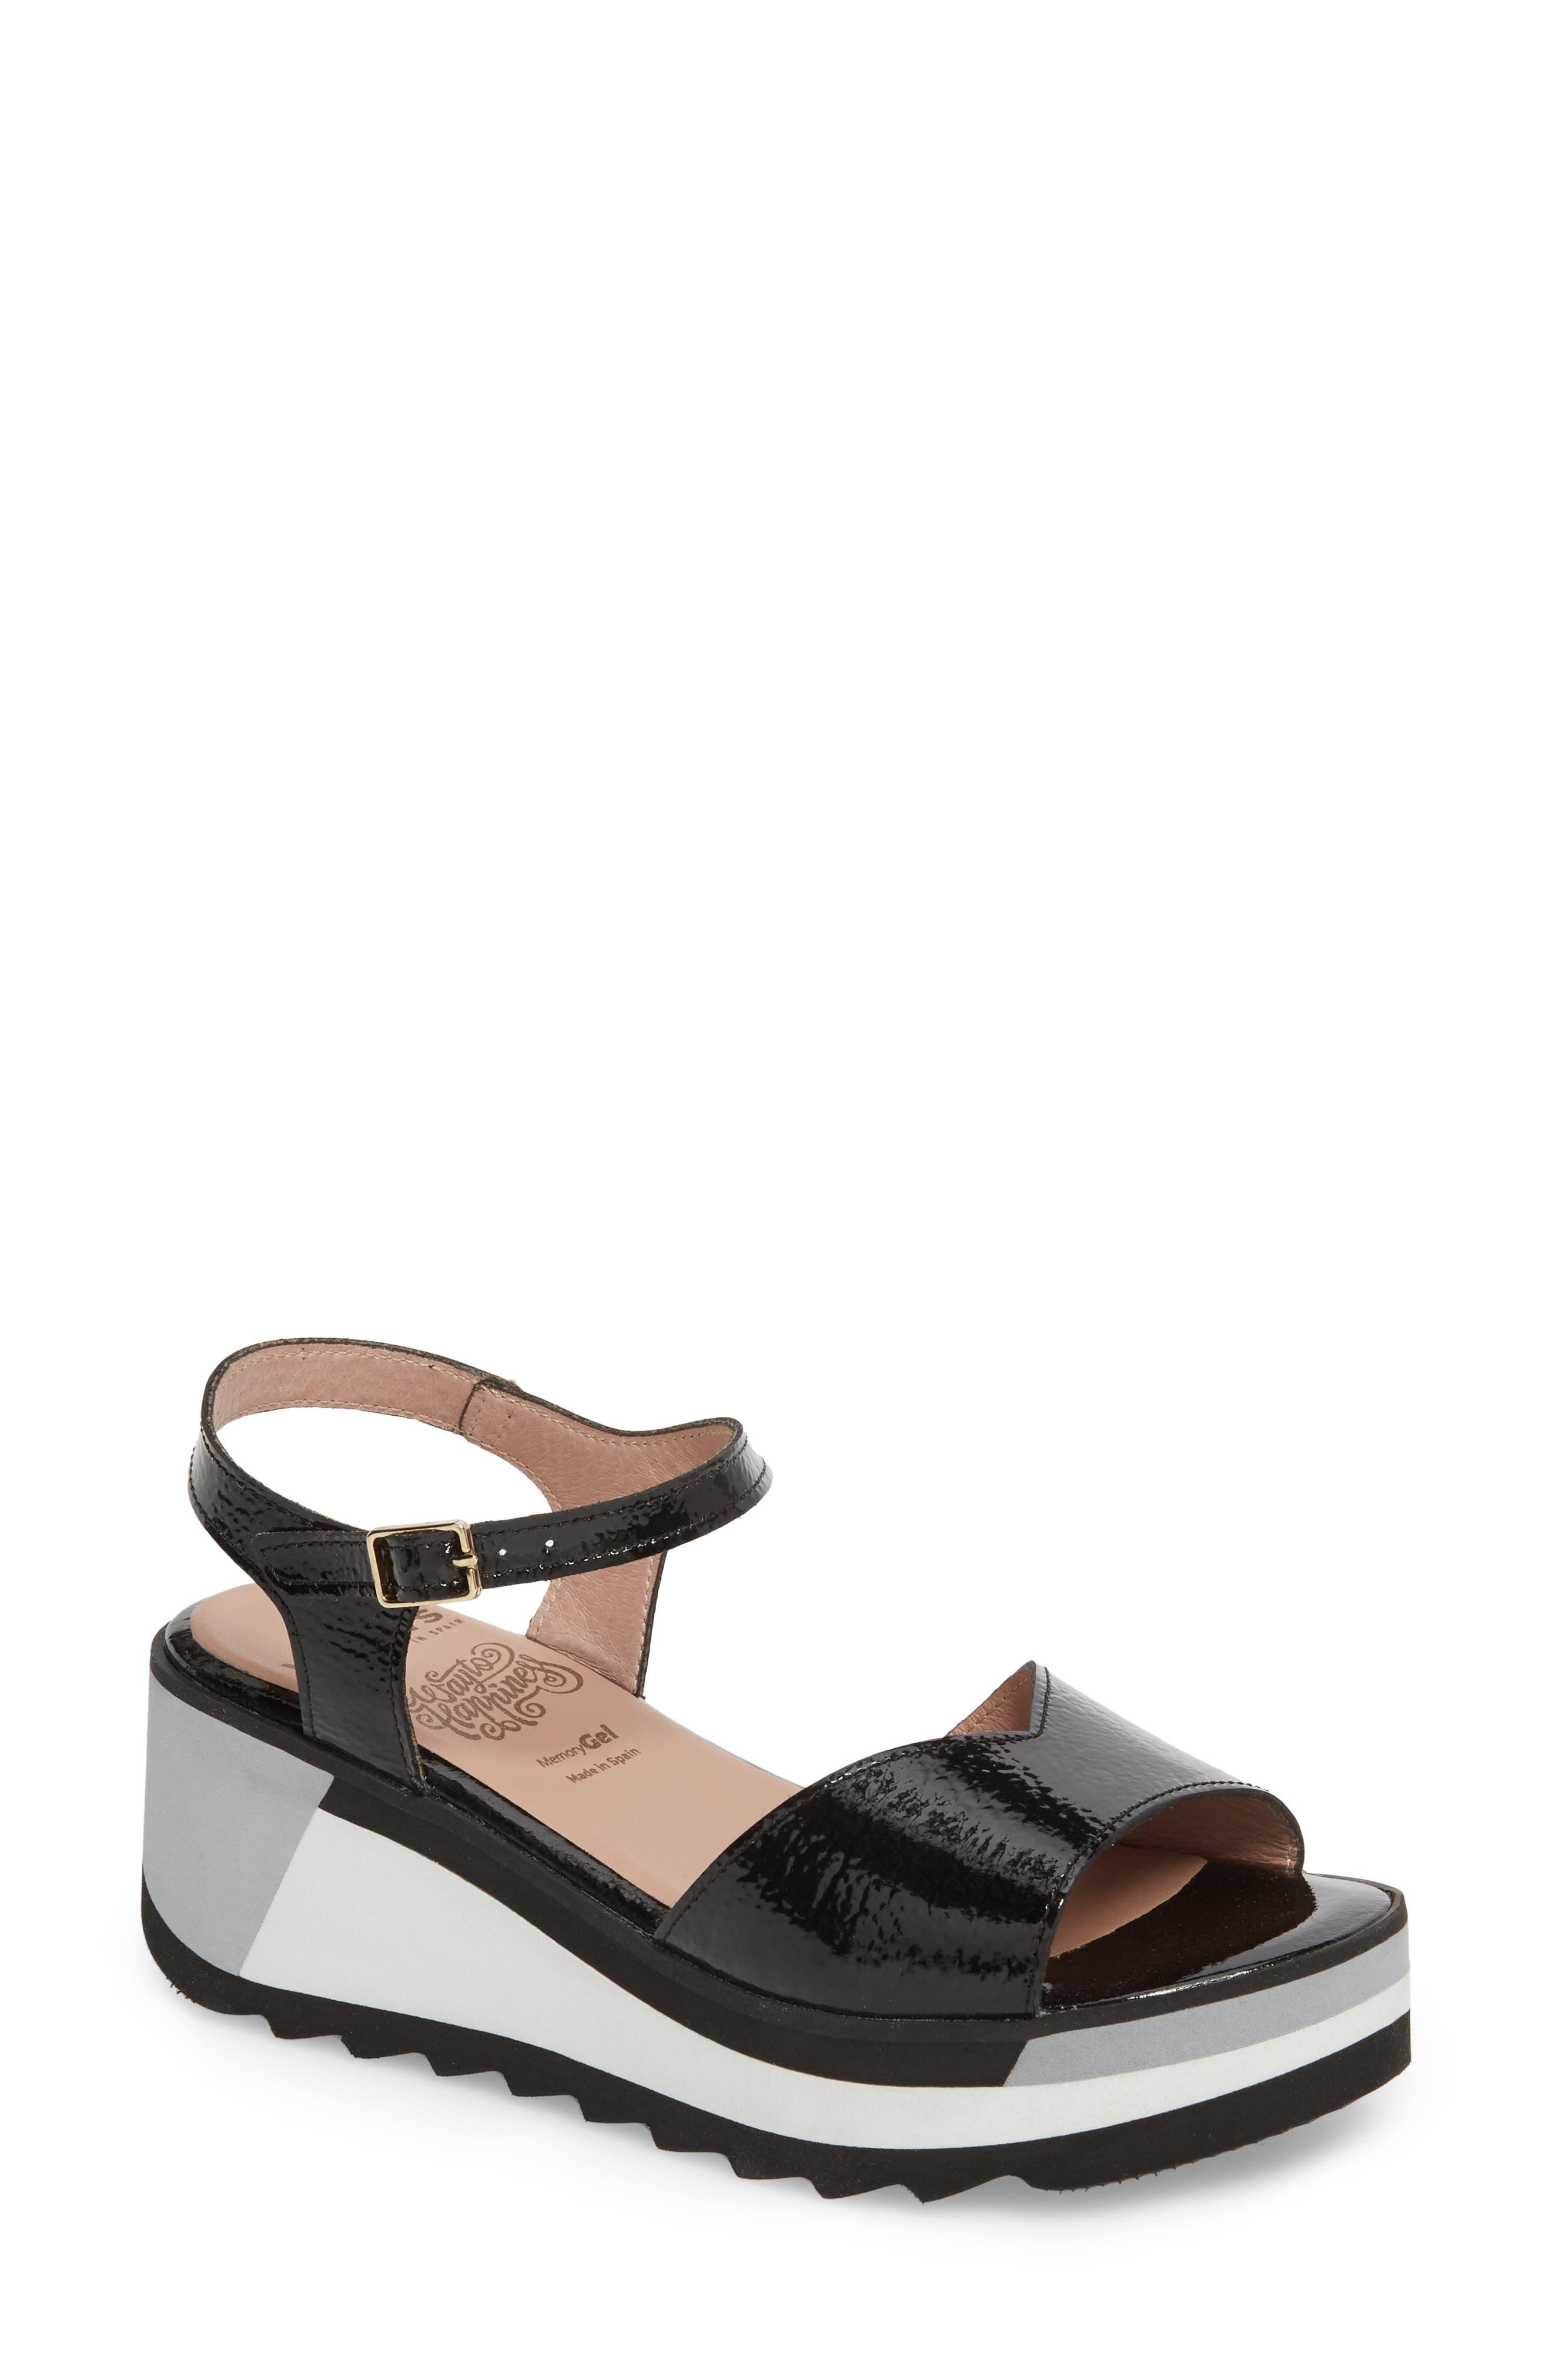 Wonders D-7810 Sandal - Black